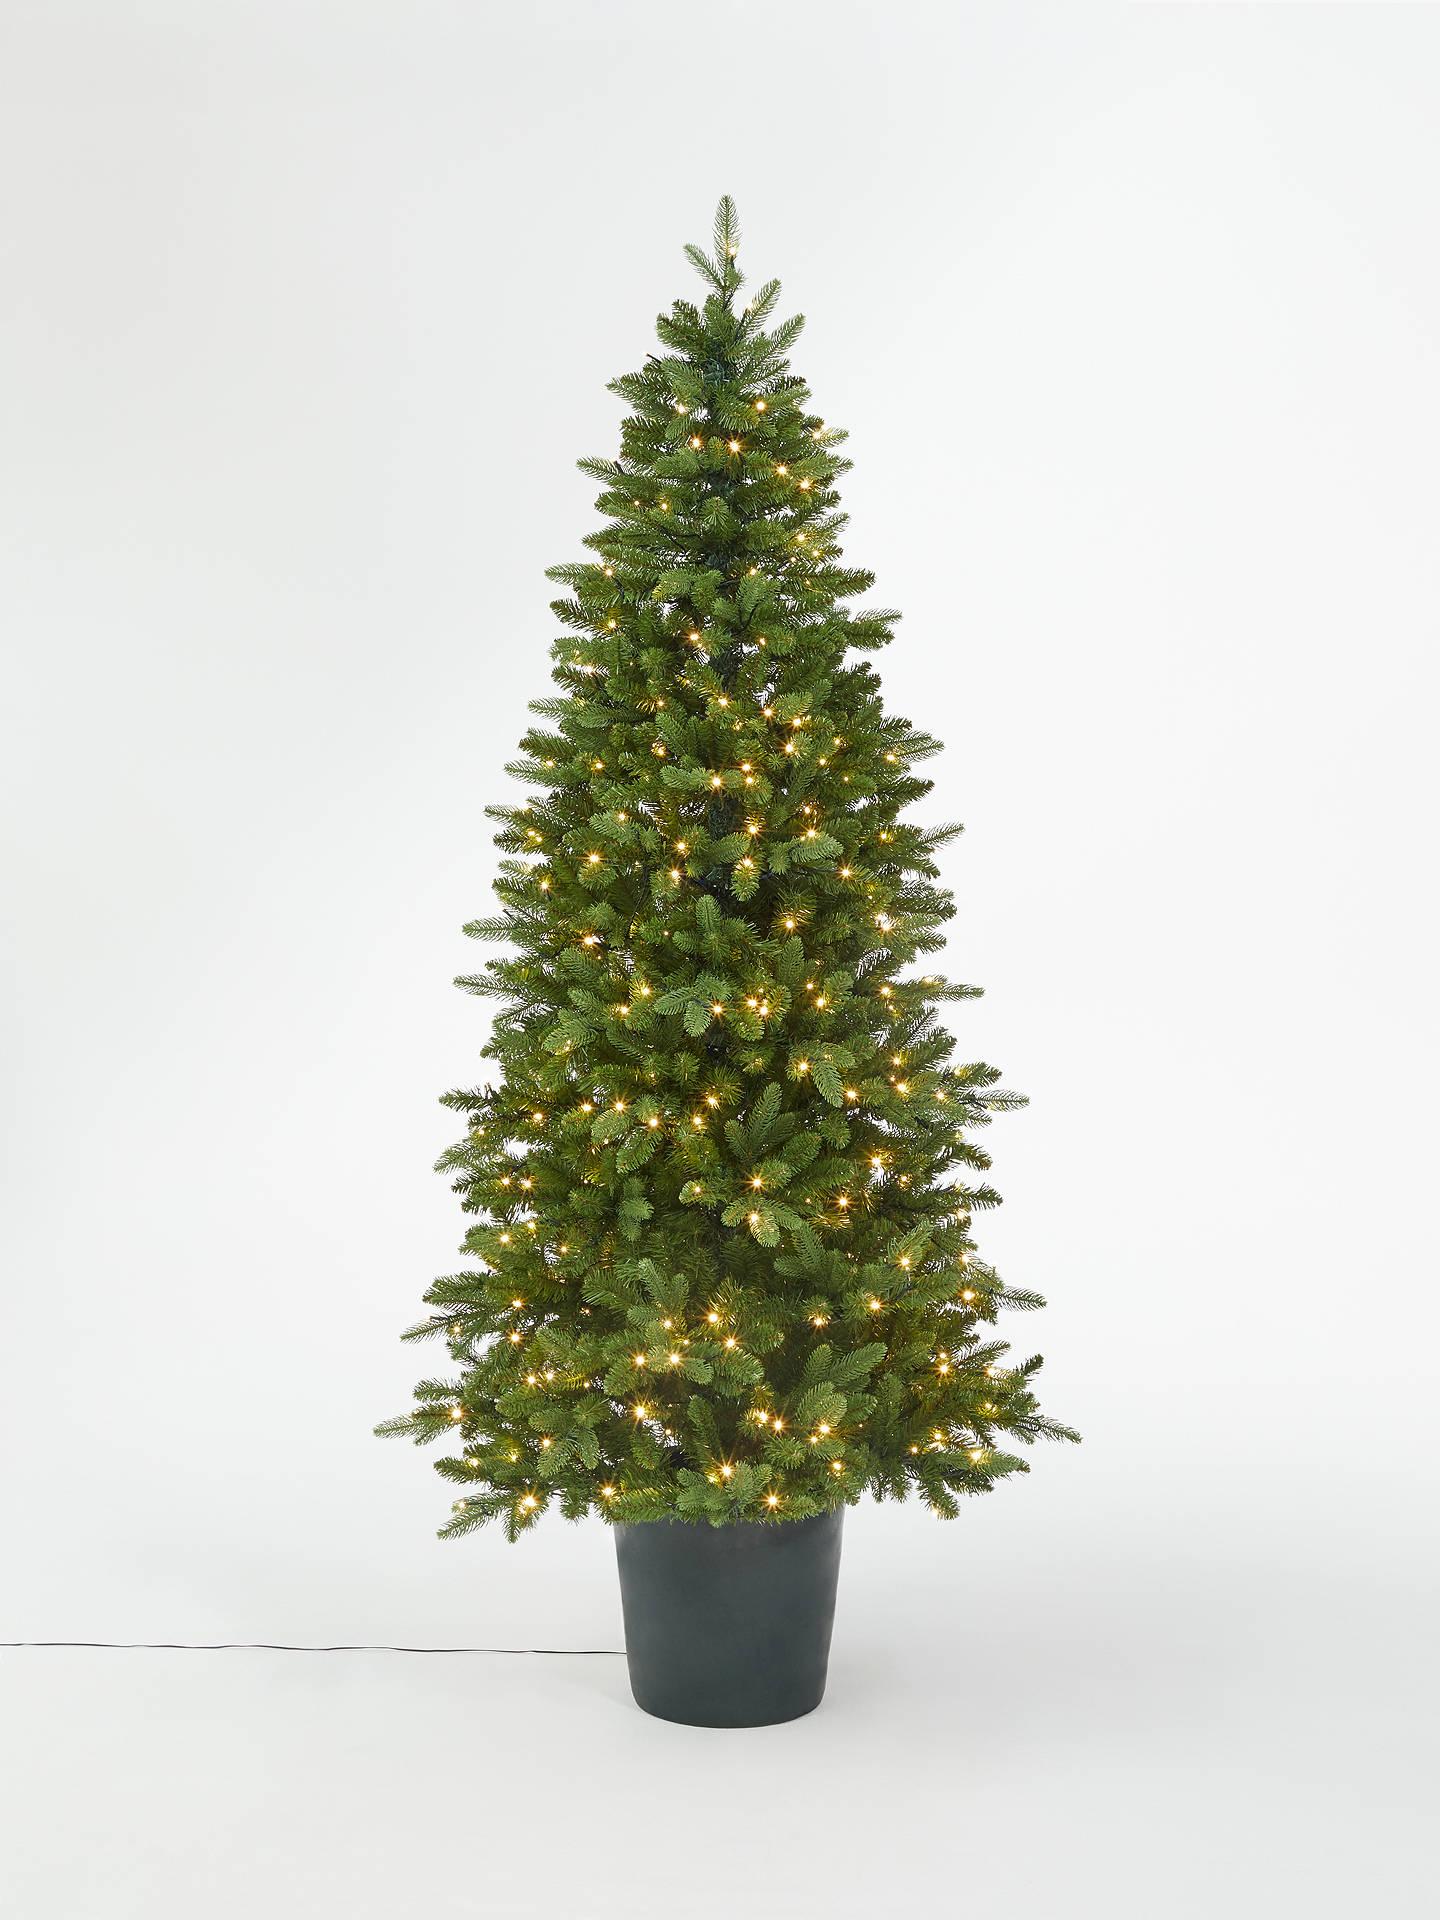 John Lewis & Partners Bala Green Potted Pre-lit Christmas Tree, 7ft at John Lewis & Partners